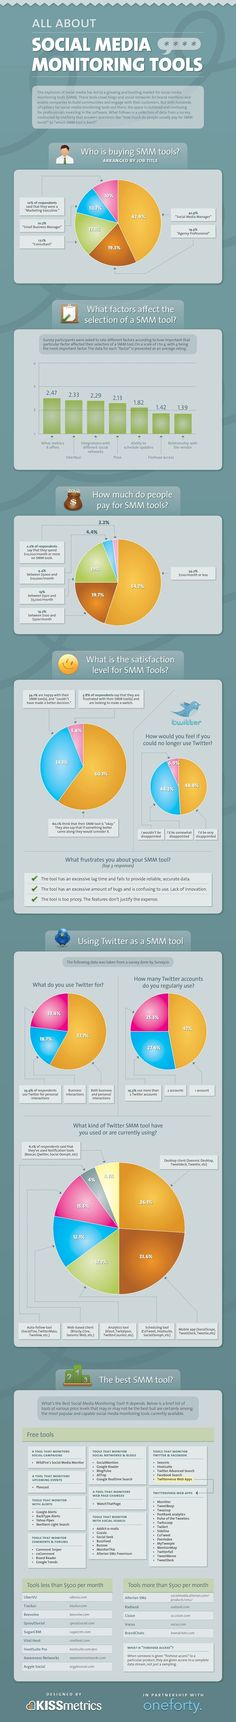 Social Media Monitoring Tools #Infographic